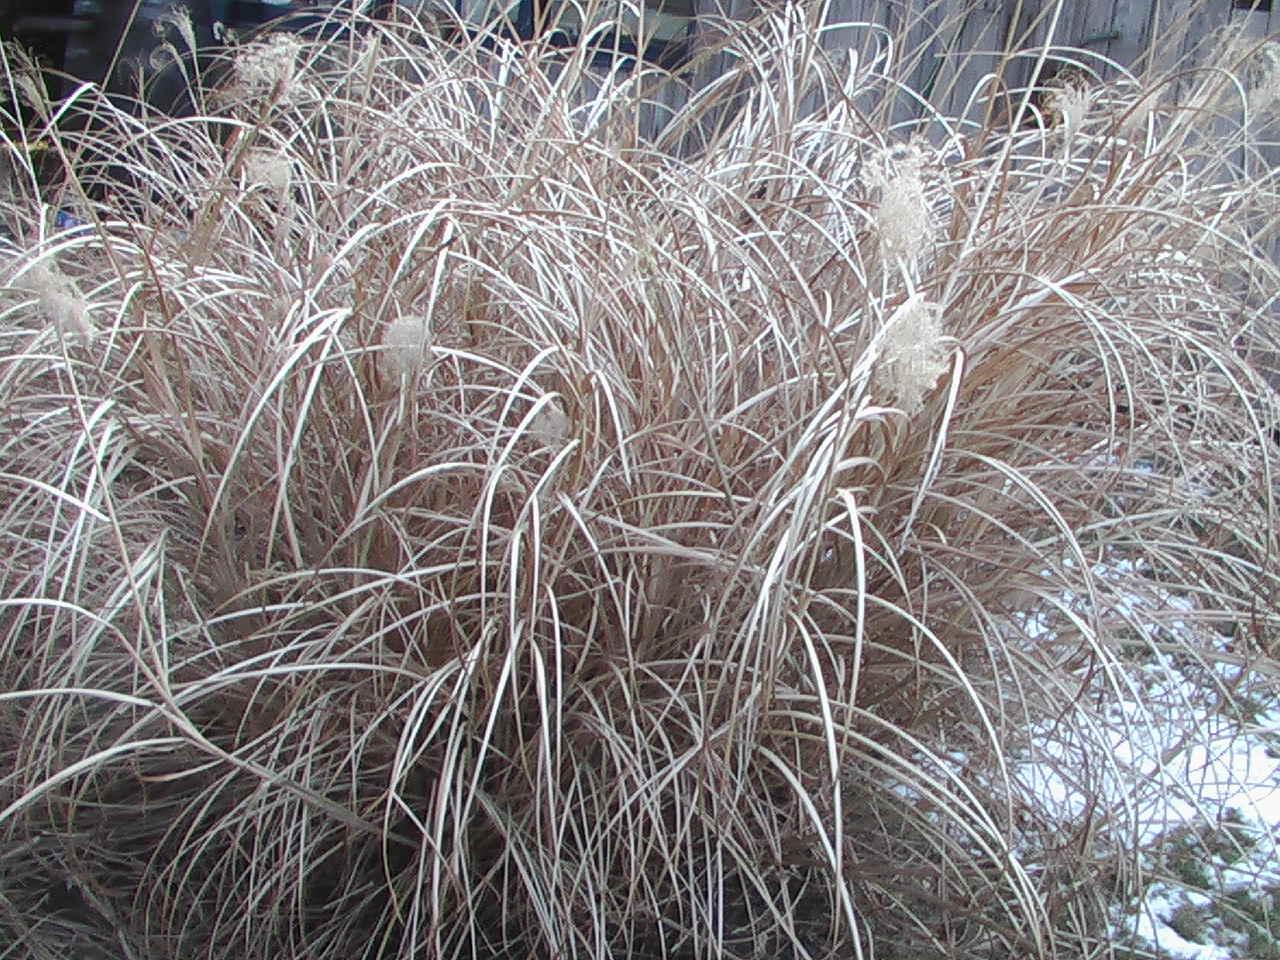 carpe diem haiku kai carpe diem 68 winter grasses fuyu. Black Bedroom Furniture Sets. Home Design Ideas